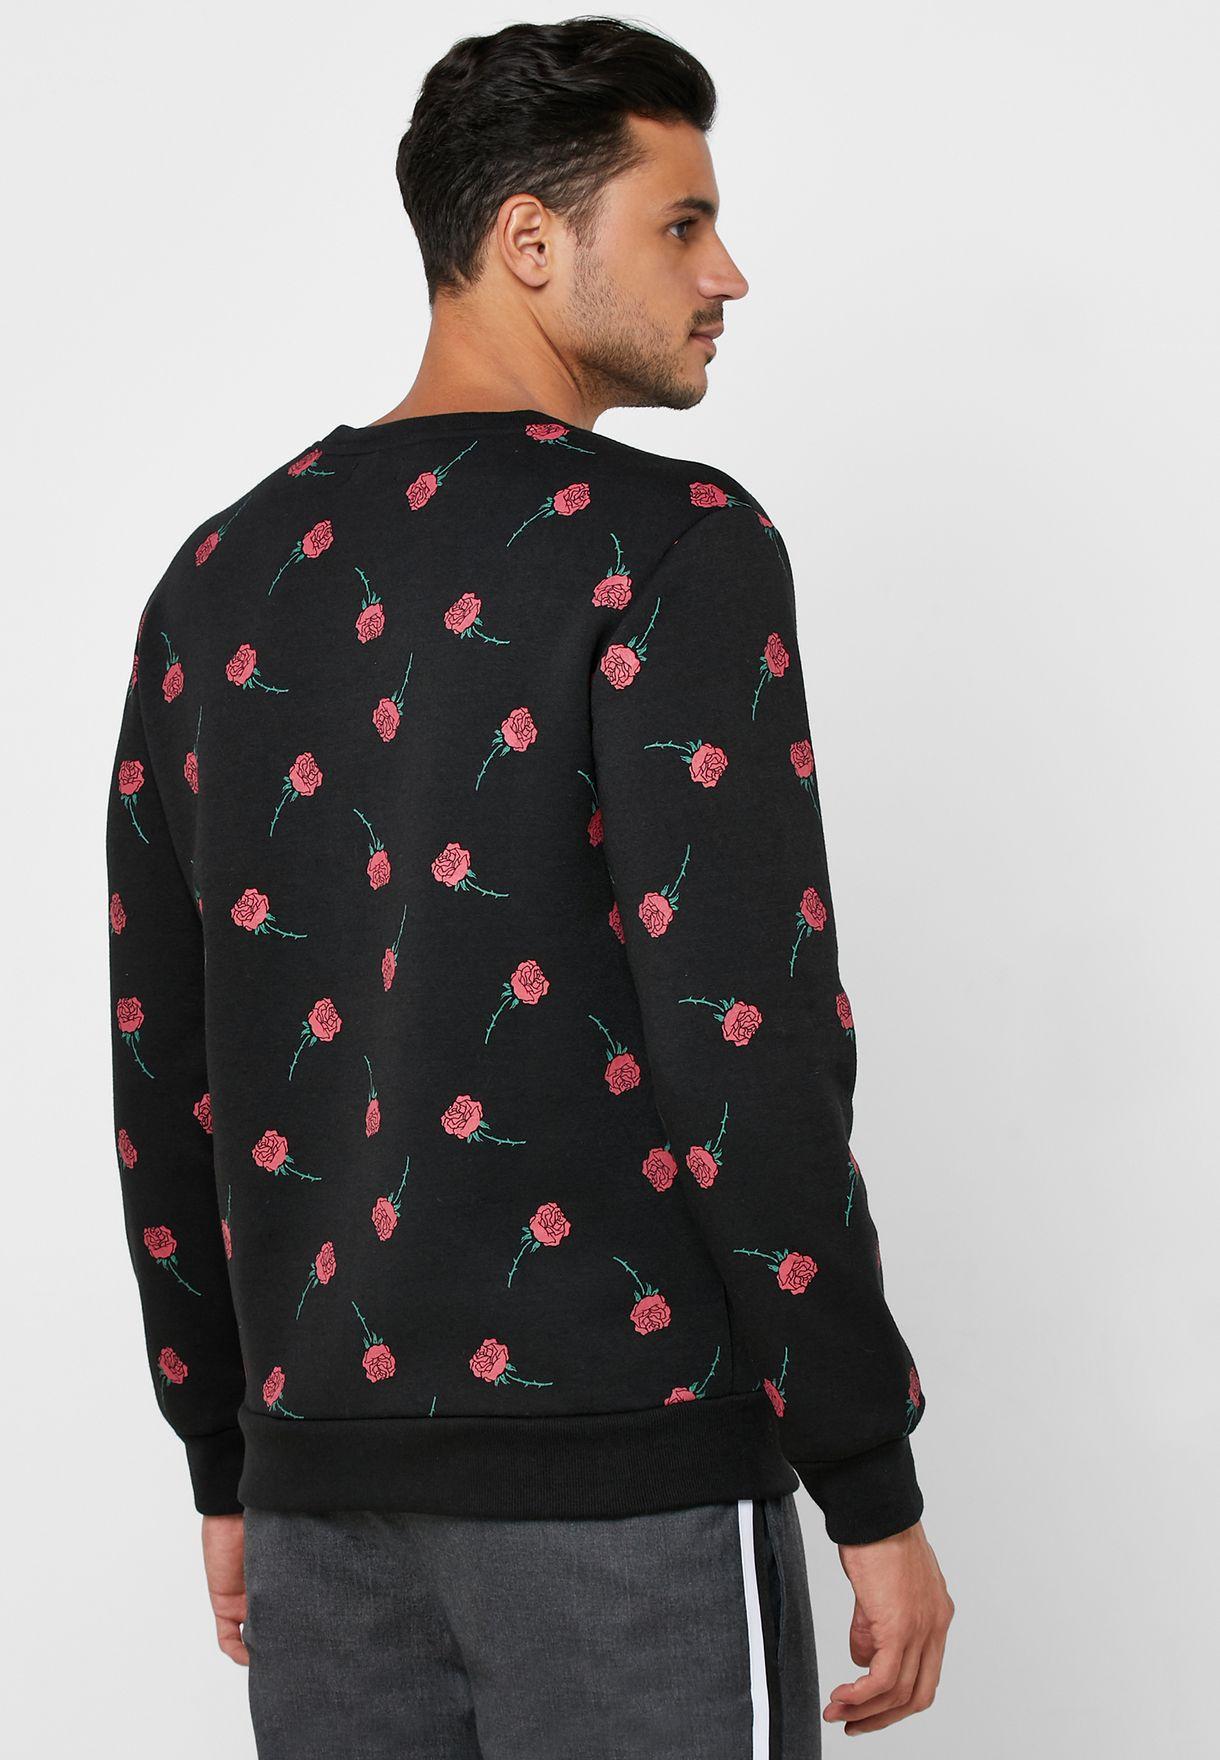 Rose Print Sweatshirt